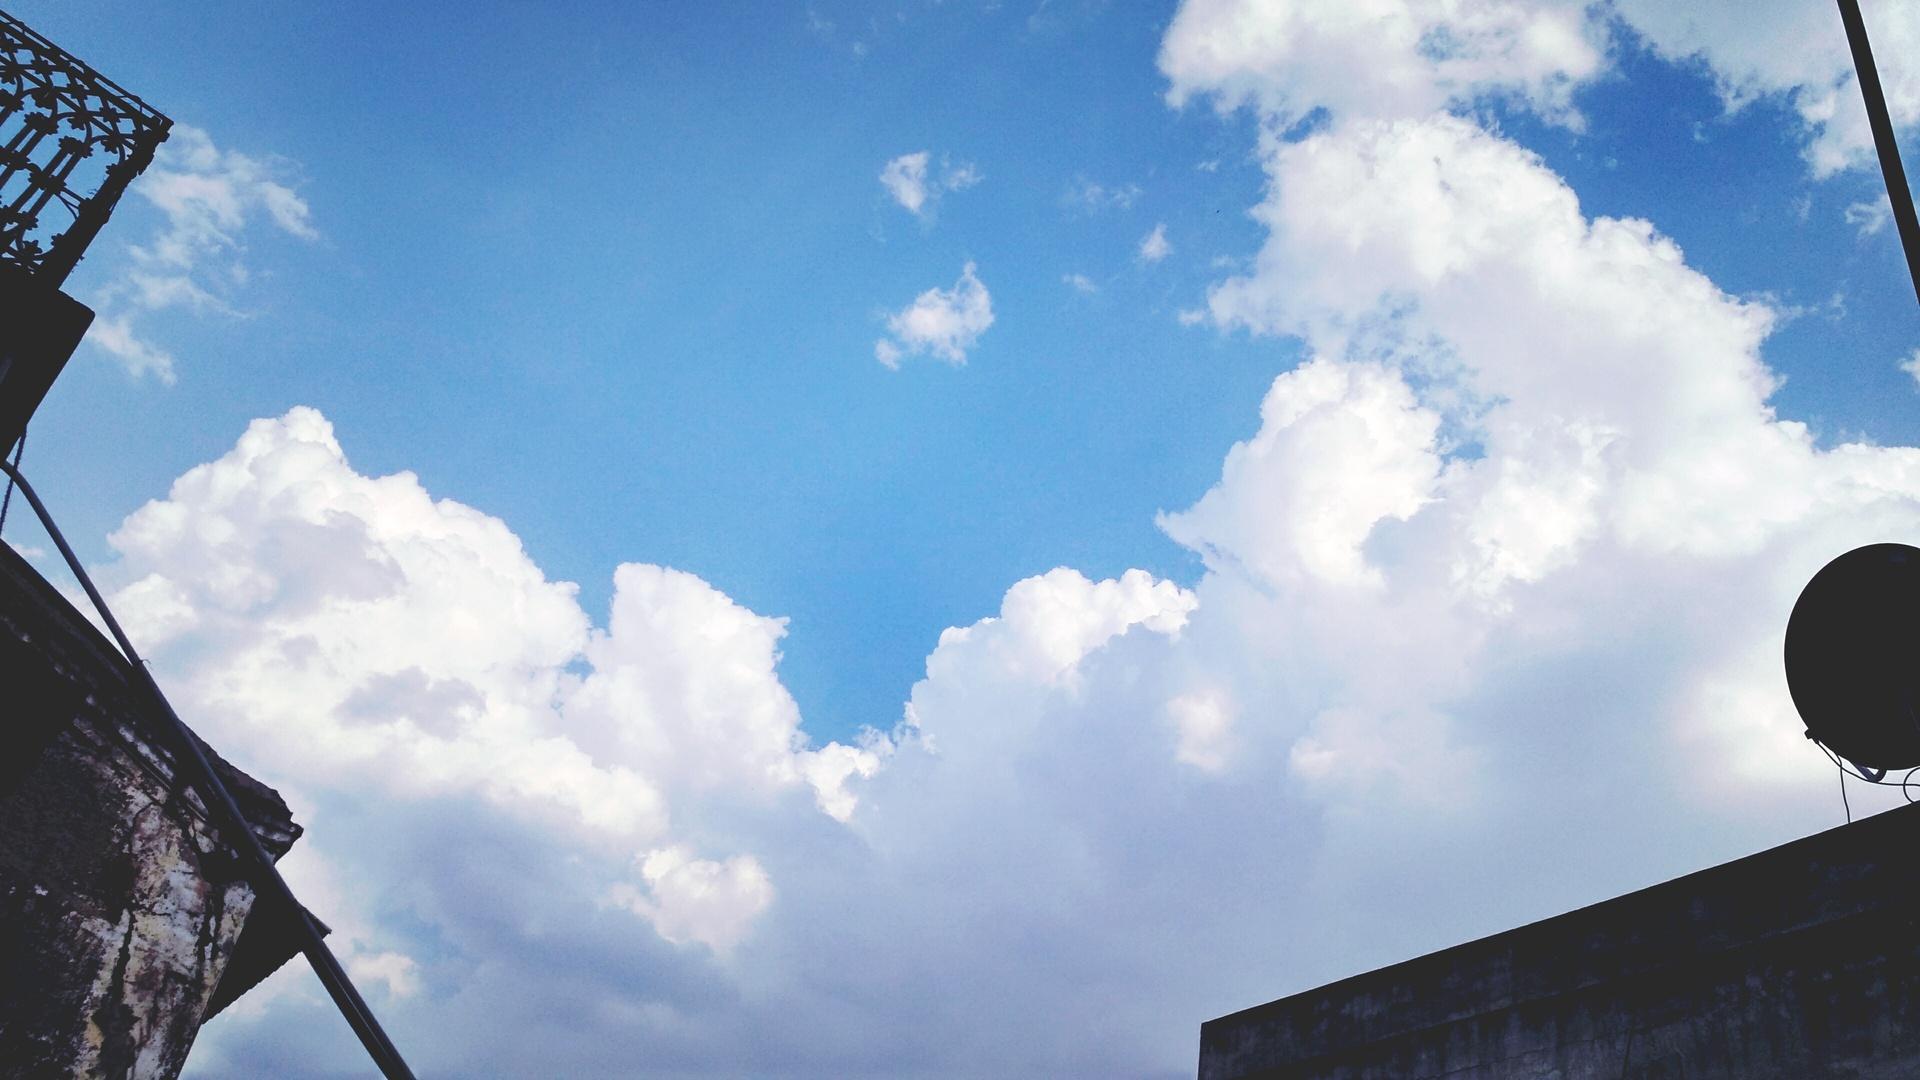 Clean Cloudy | yashgupta1, architecture, blue sky, cloud